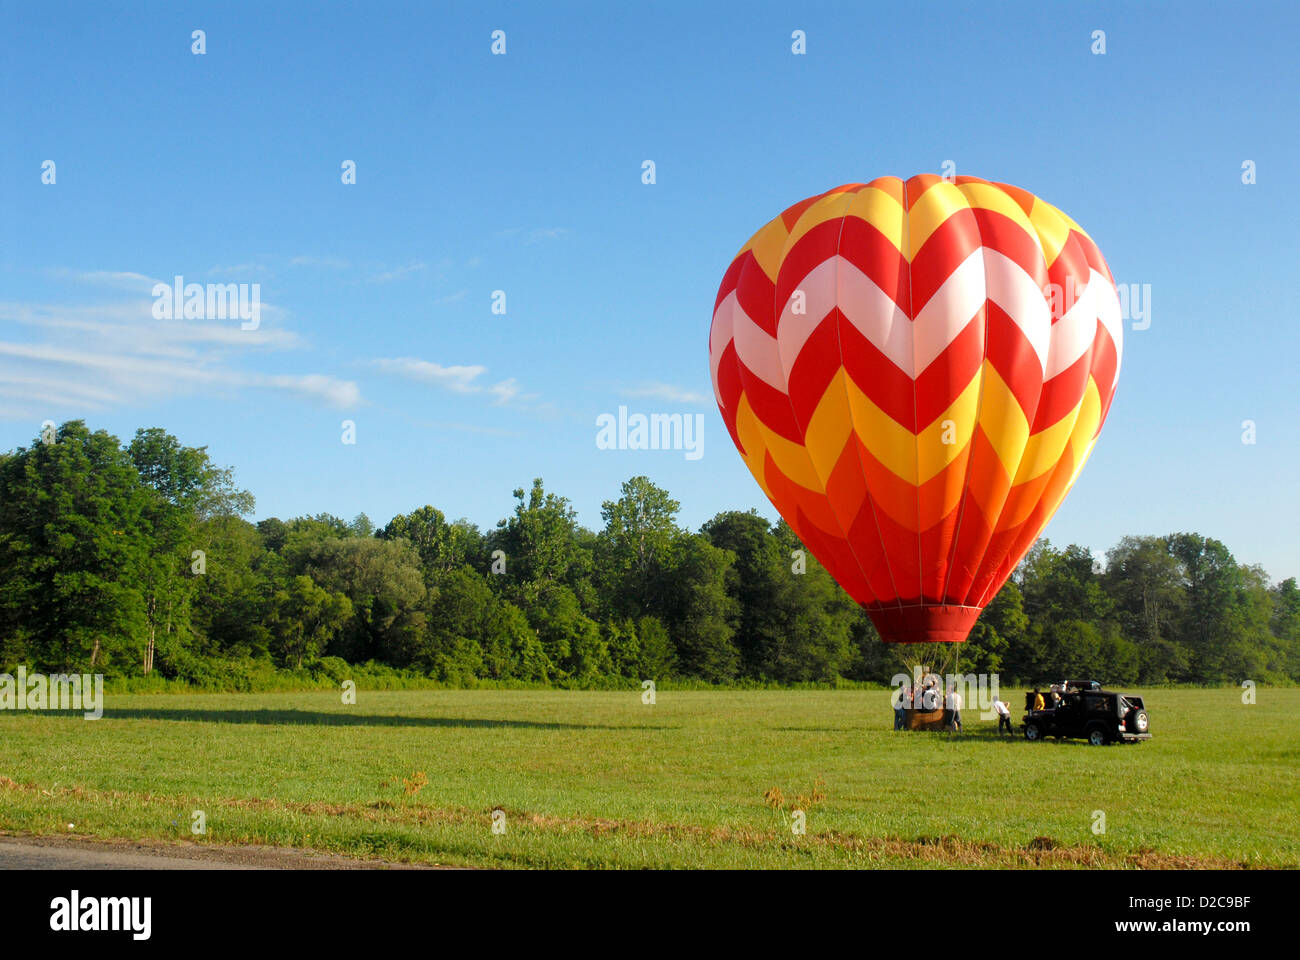 Hot Air Balloon, Wellsville, New York - Stock Image